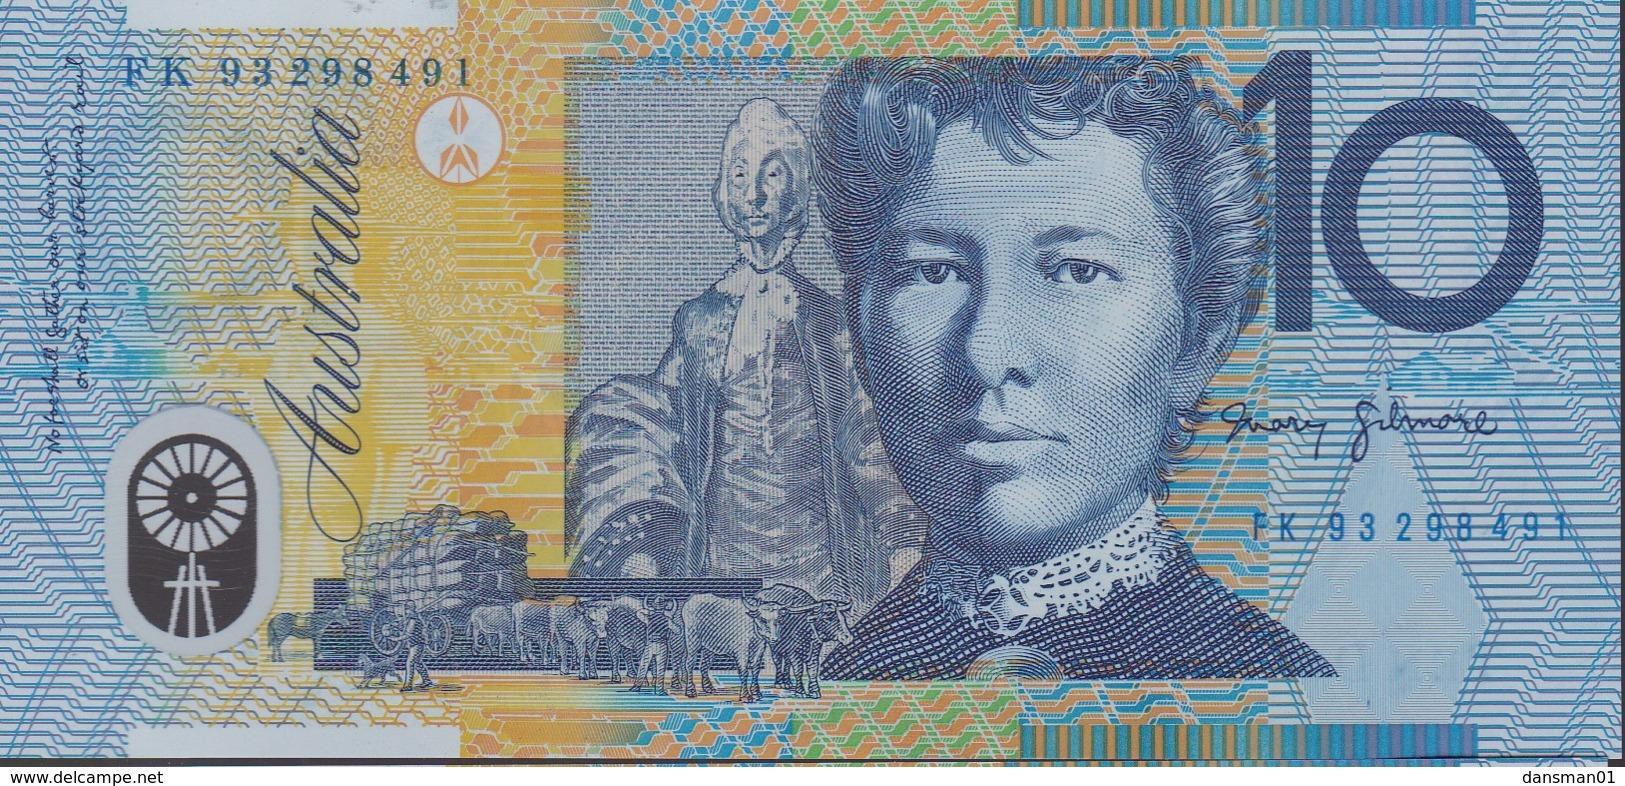 Australia 1993 Polymer $10 FK 93298491 Uncirculated - Emissioni Governative Decimali 1966-...